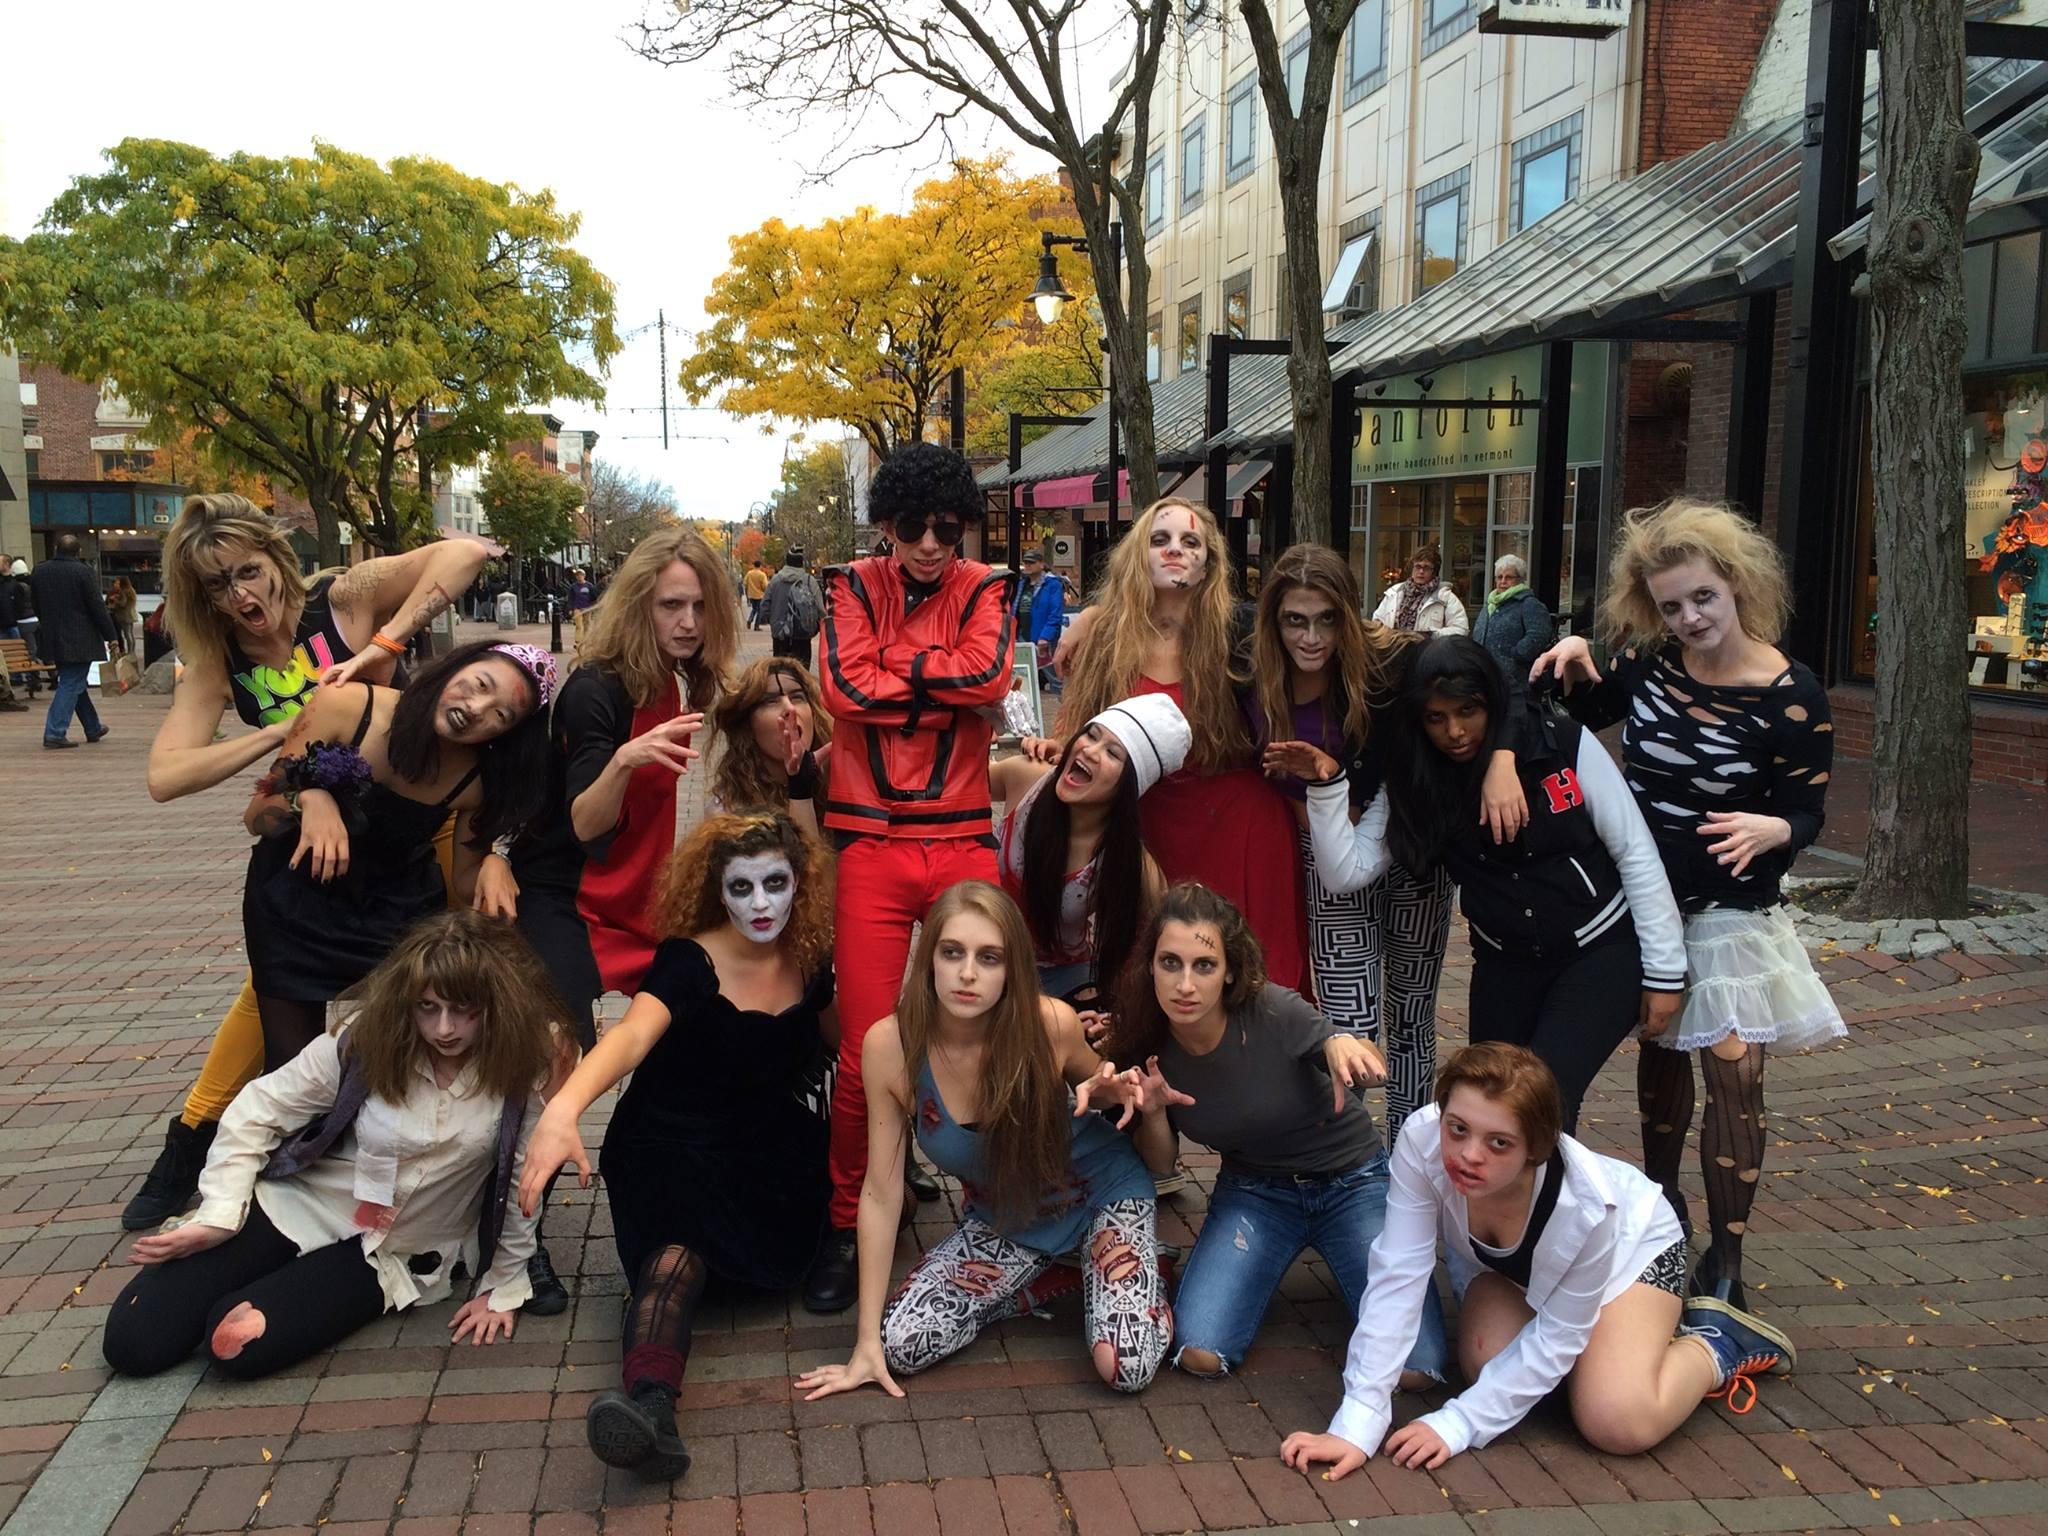 Josh & His Dance Troupe, Thriller Flash Mob, Church Street, Burlington, VT 2014